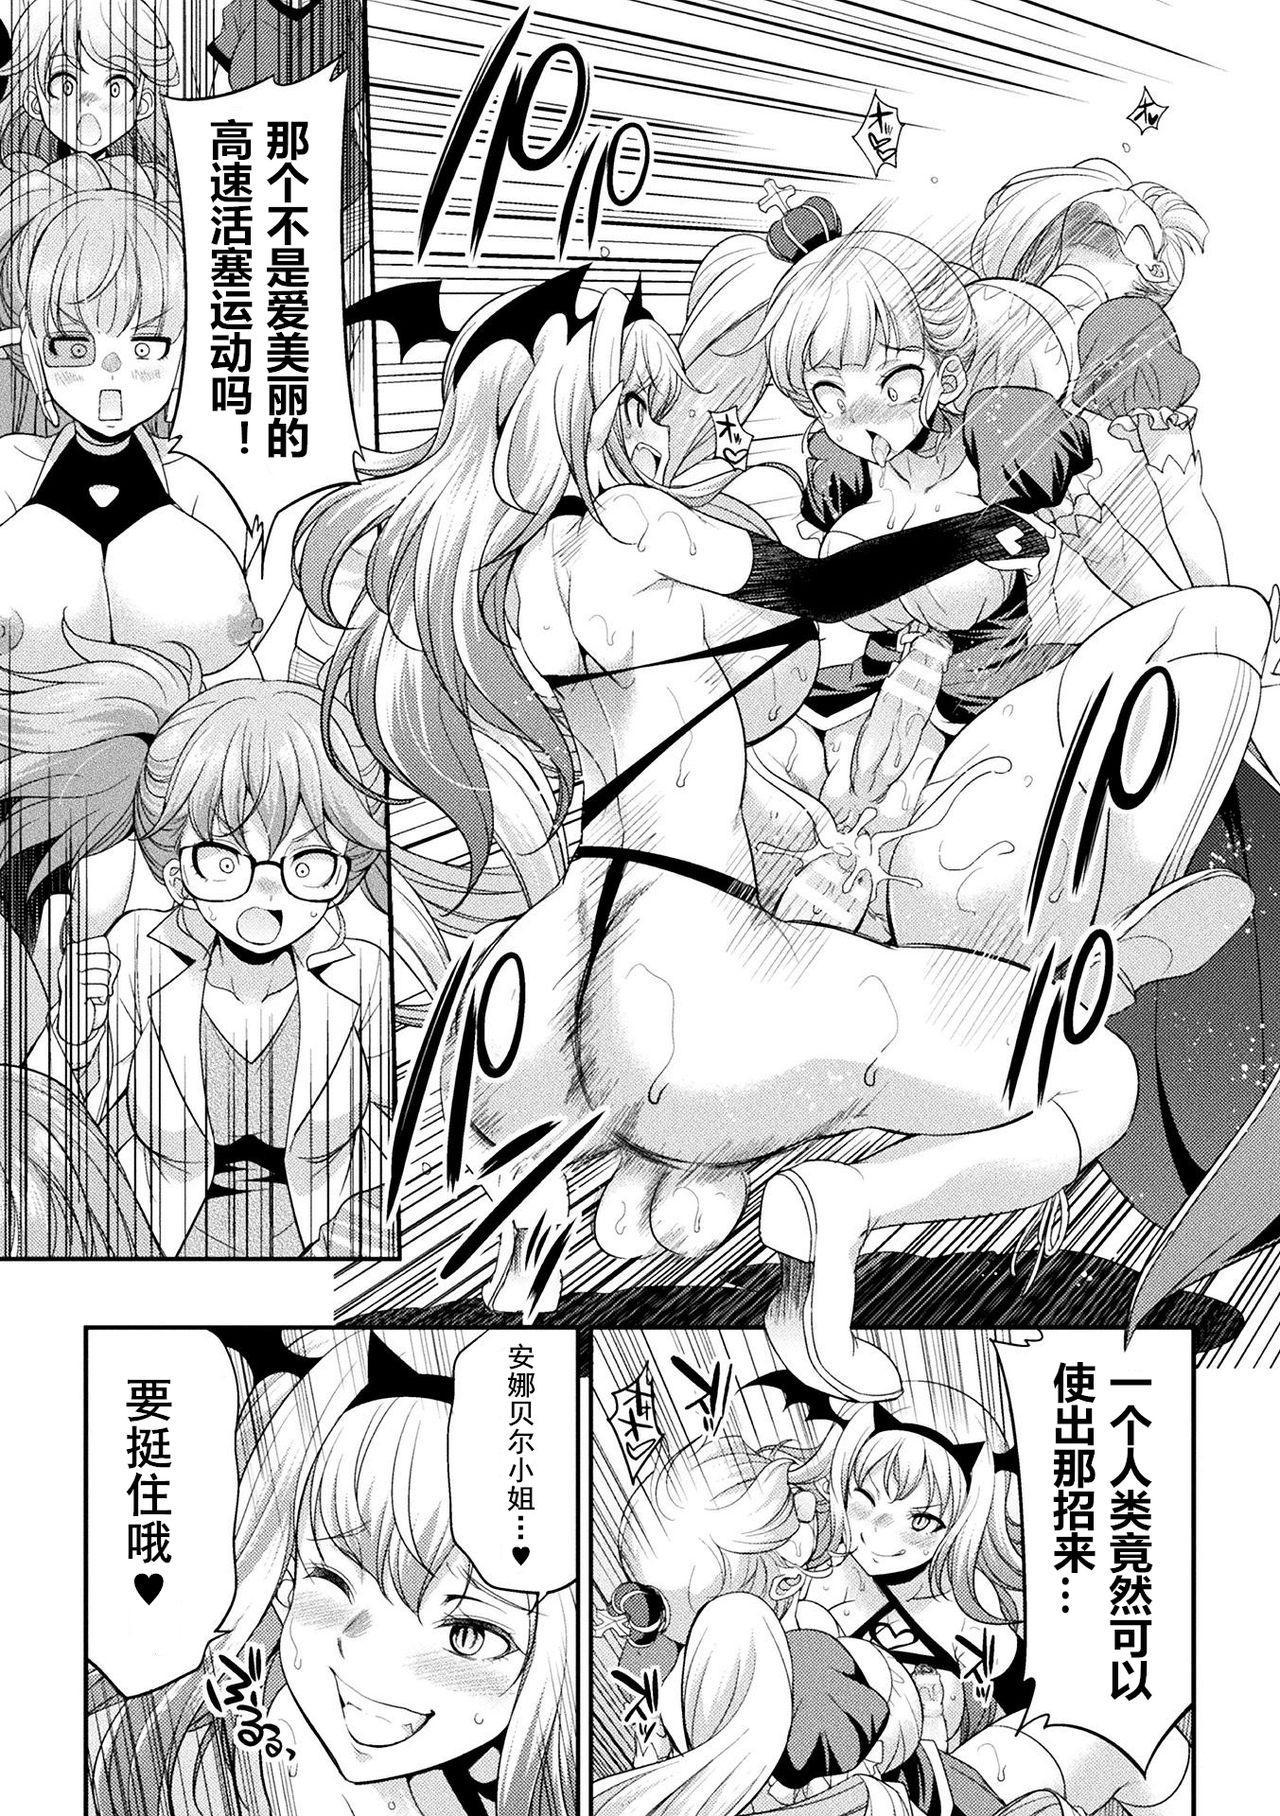 [Kaguya] Futanarijima ~The Queen of Penis~ Ch. 4 [Chinese] [黄记汉化组] 19